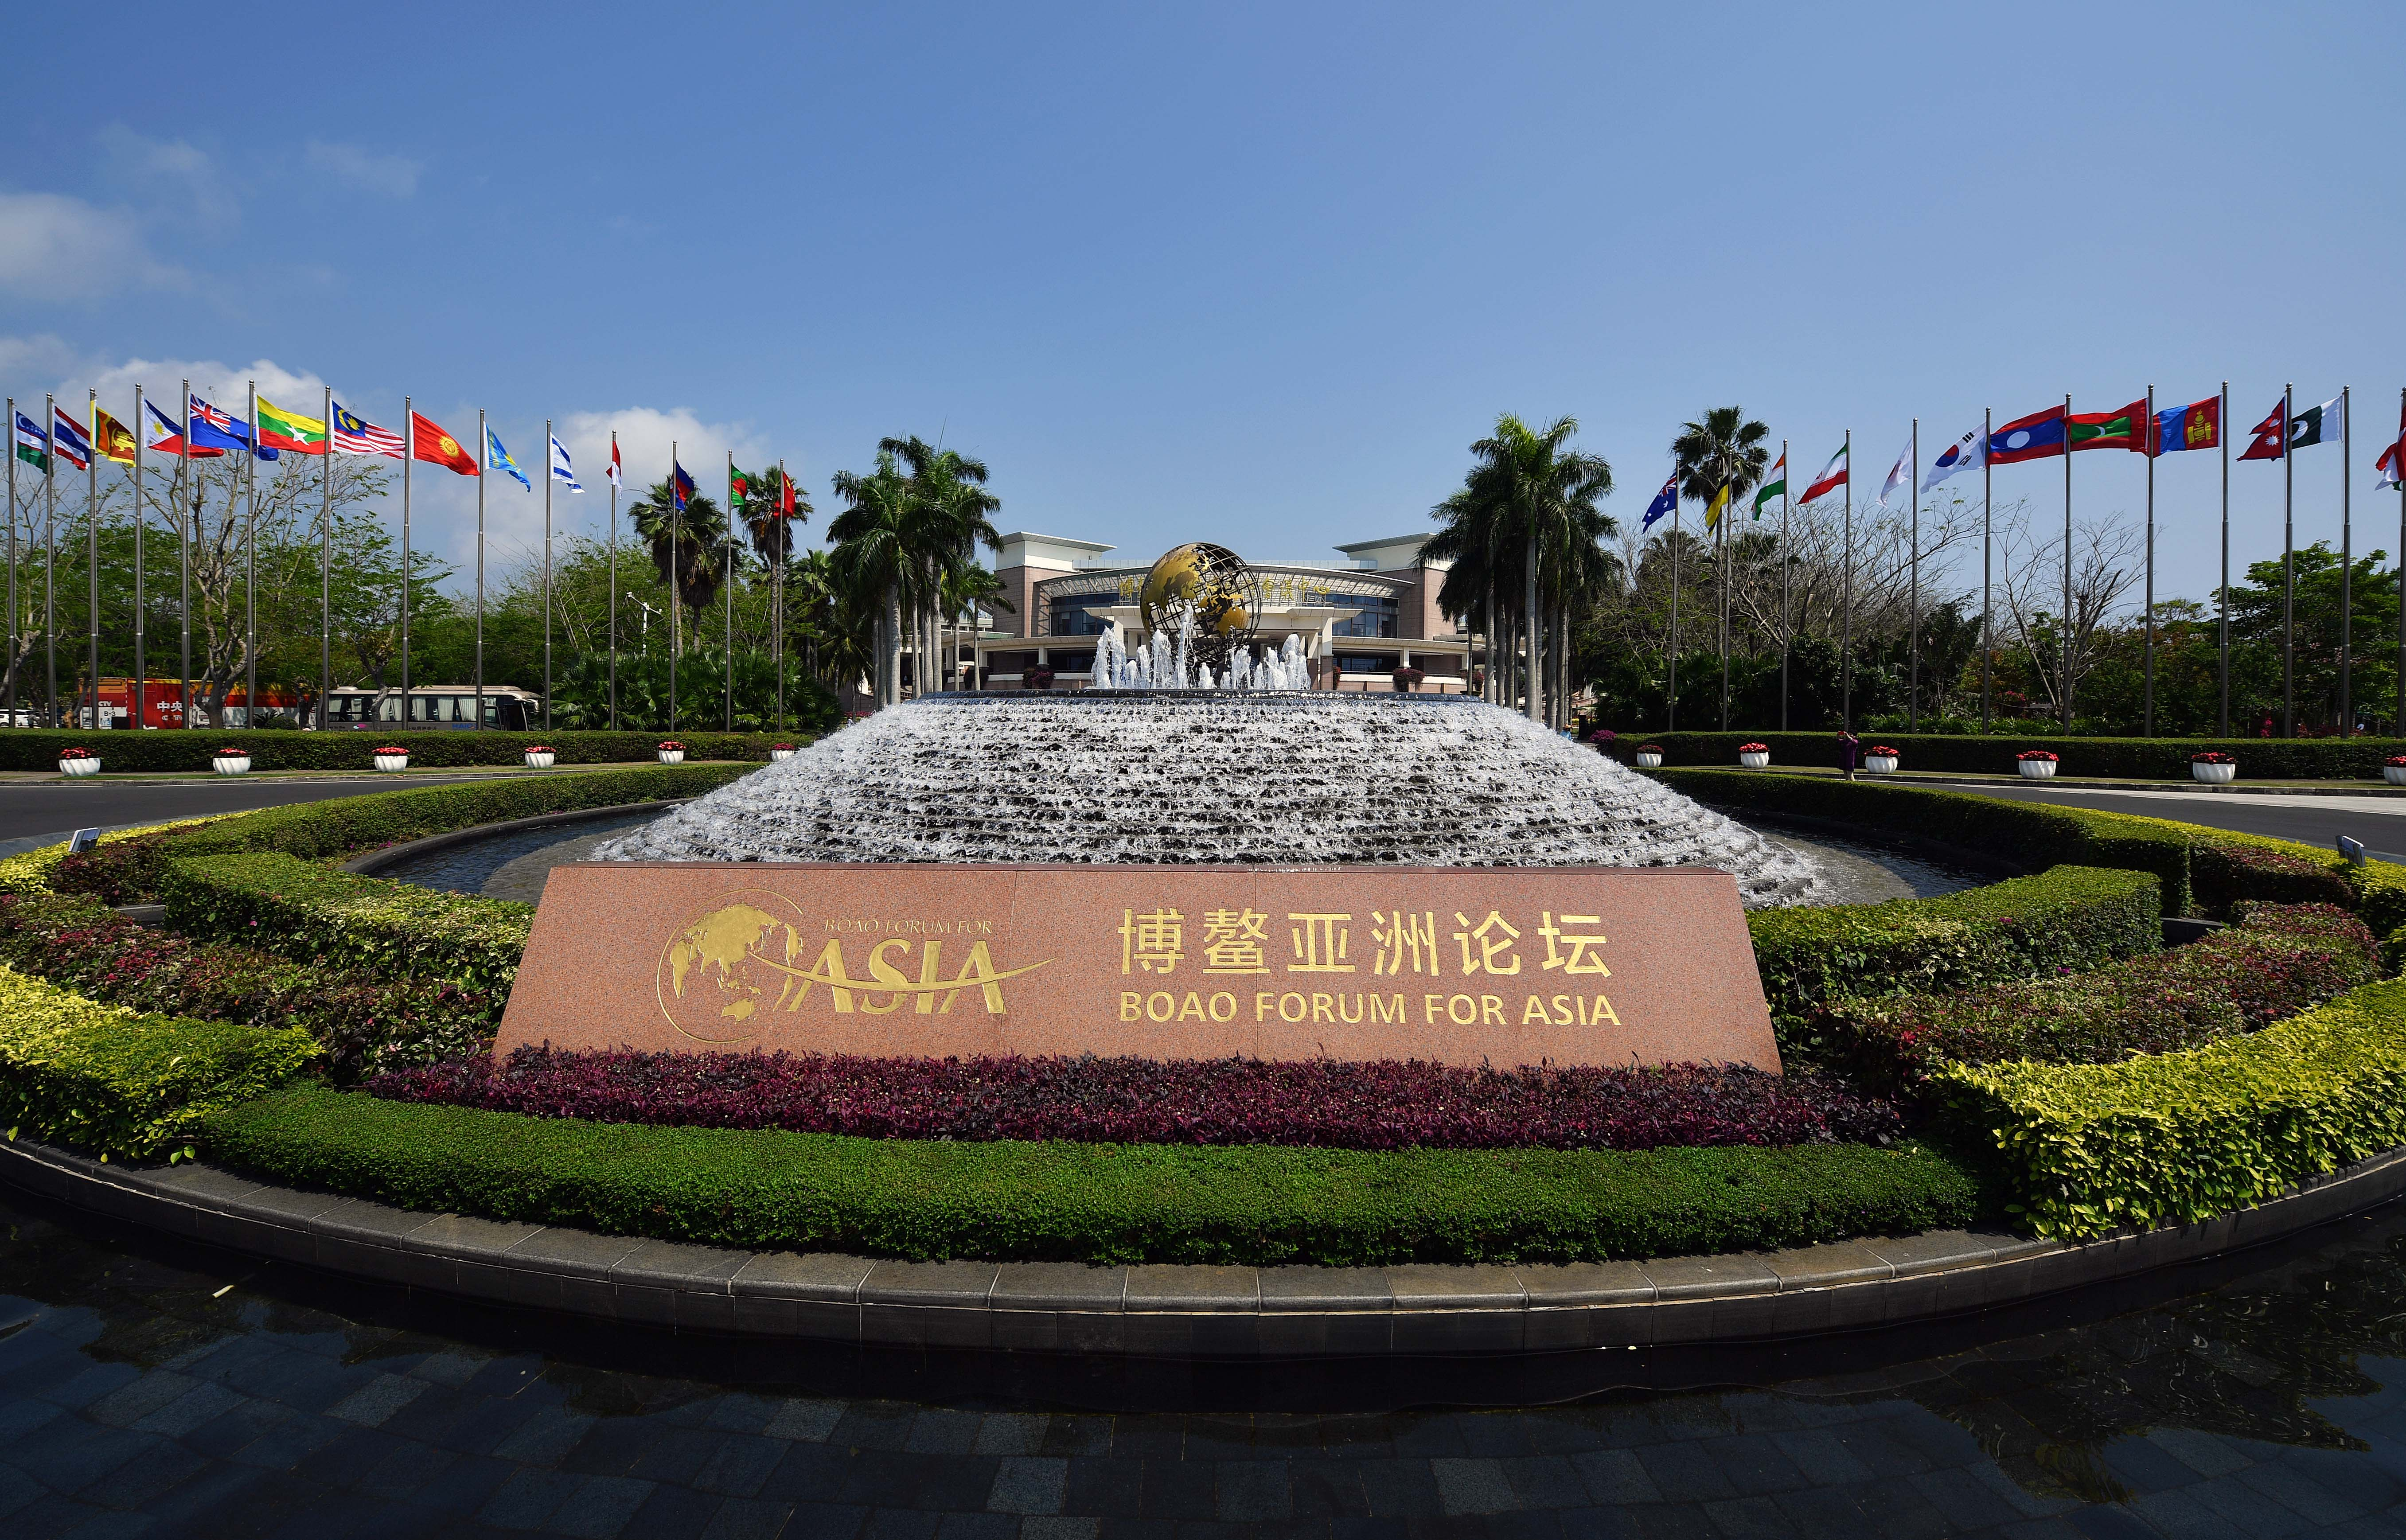 Asia becoming vibrant global innovation hub: Report